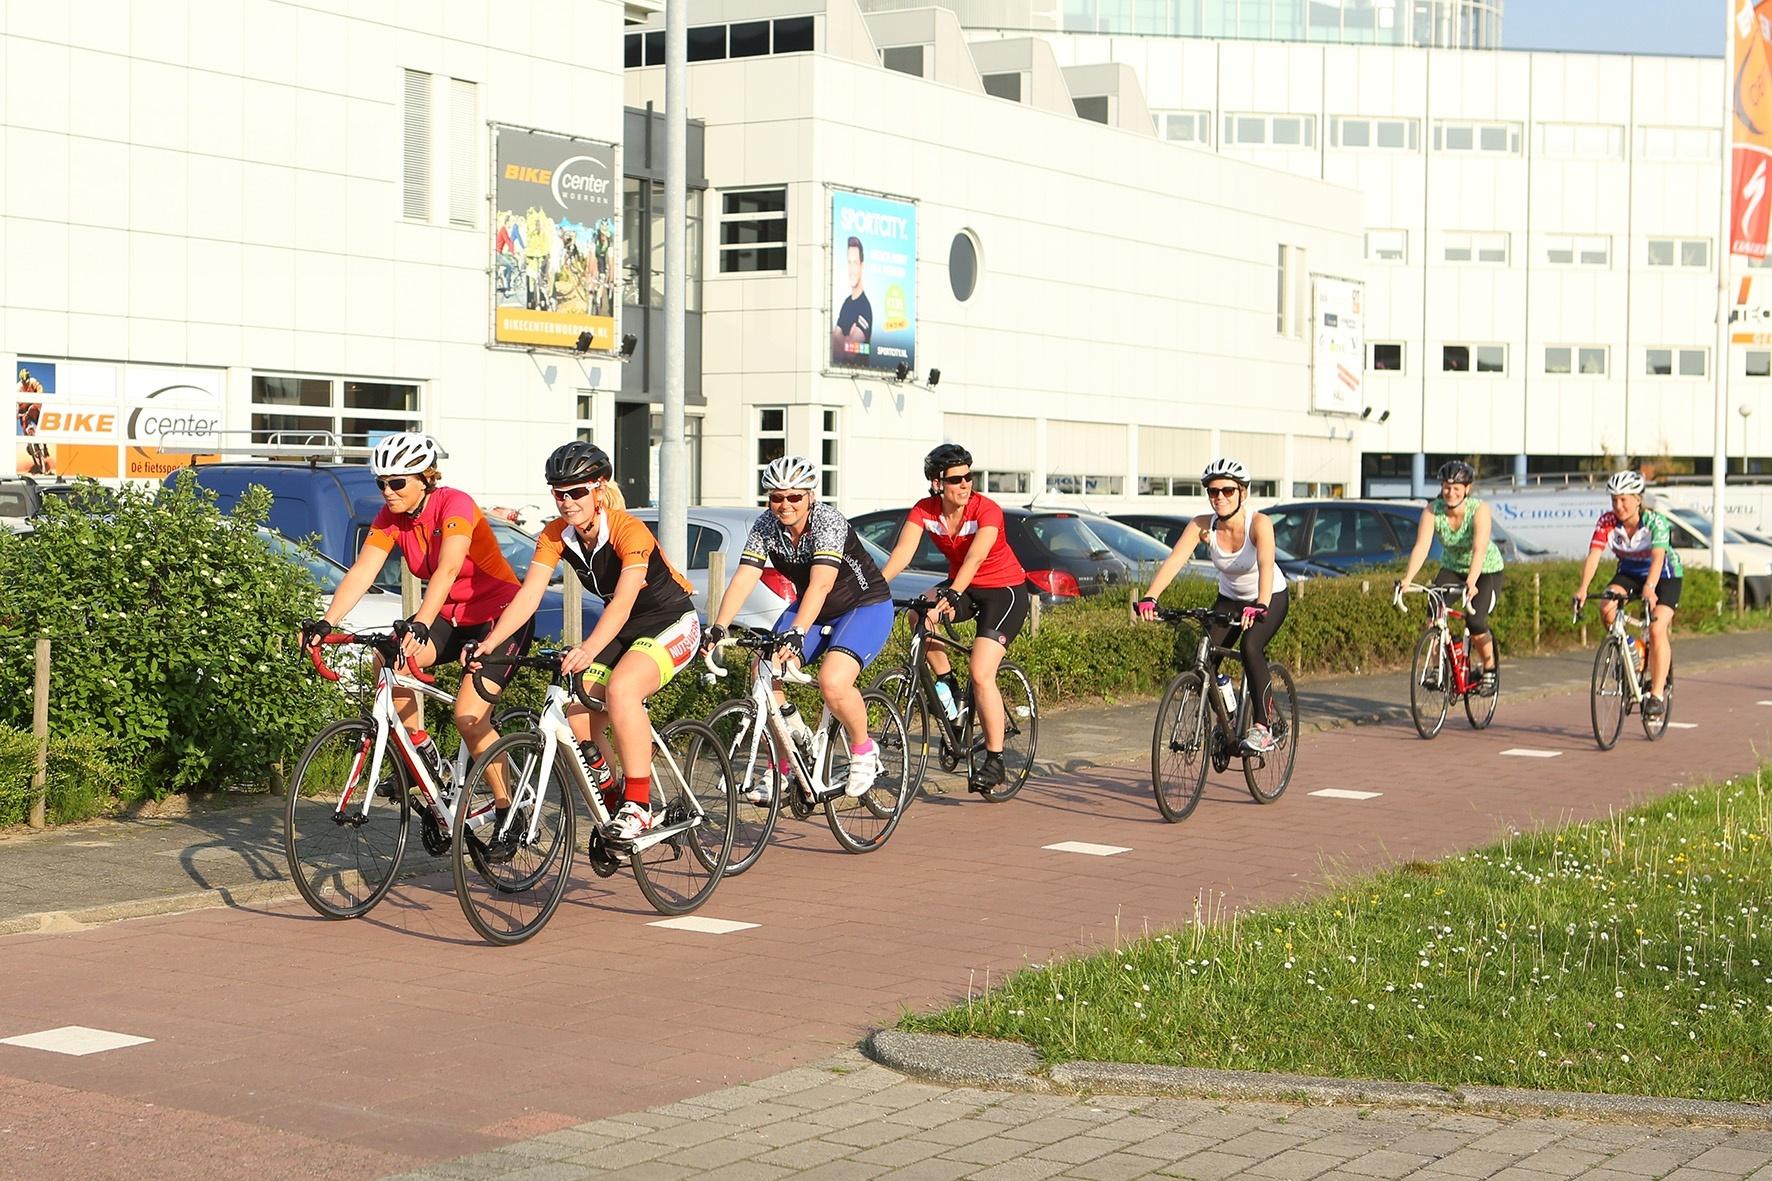 Bike Center ladysride